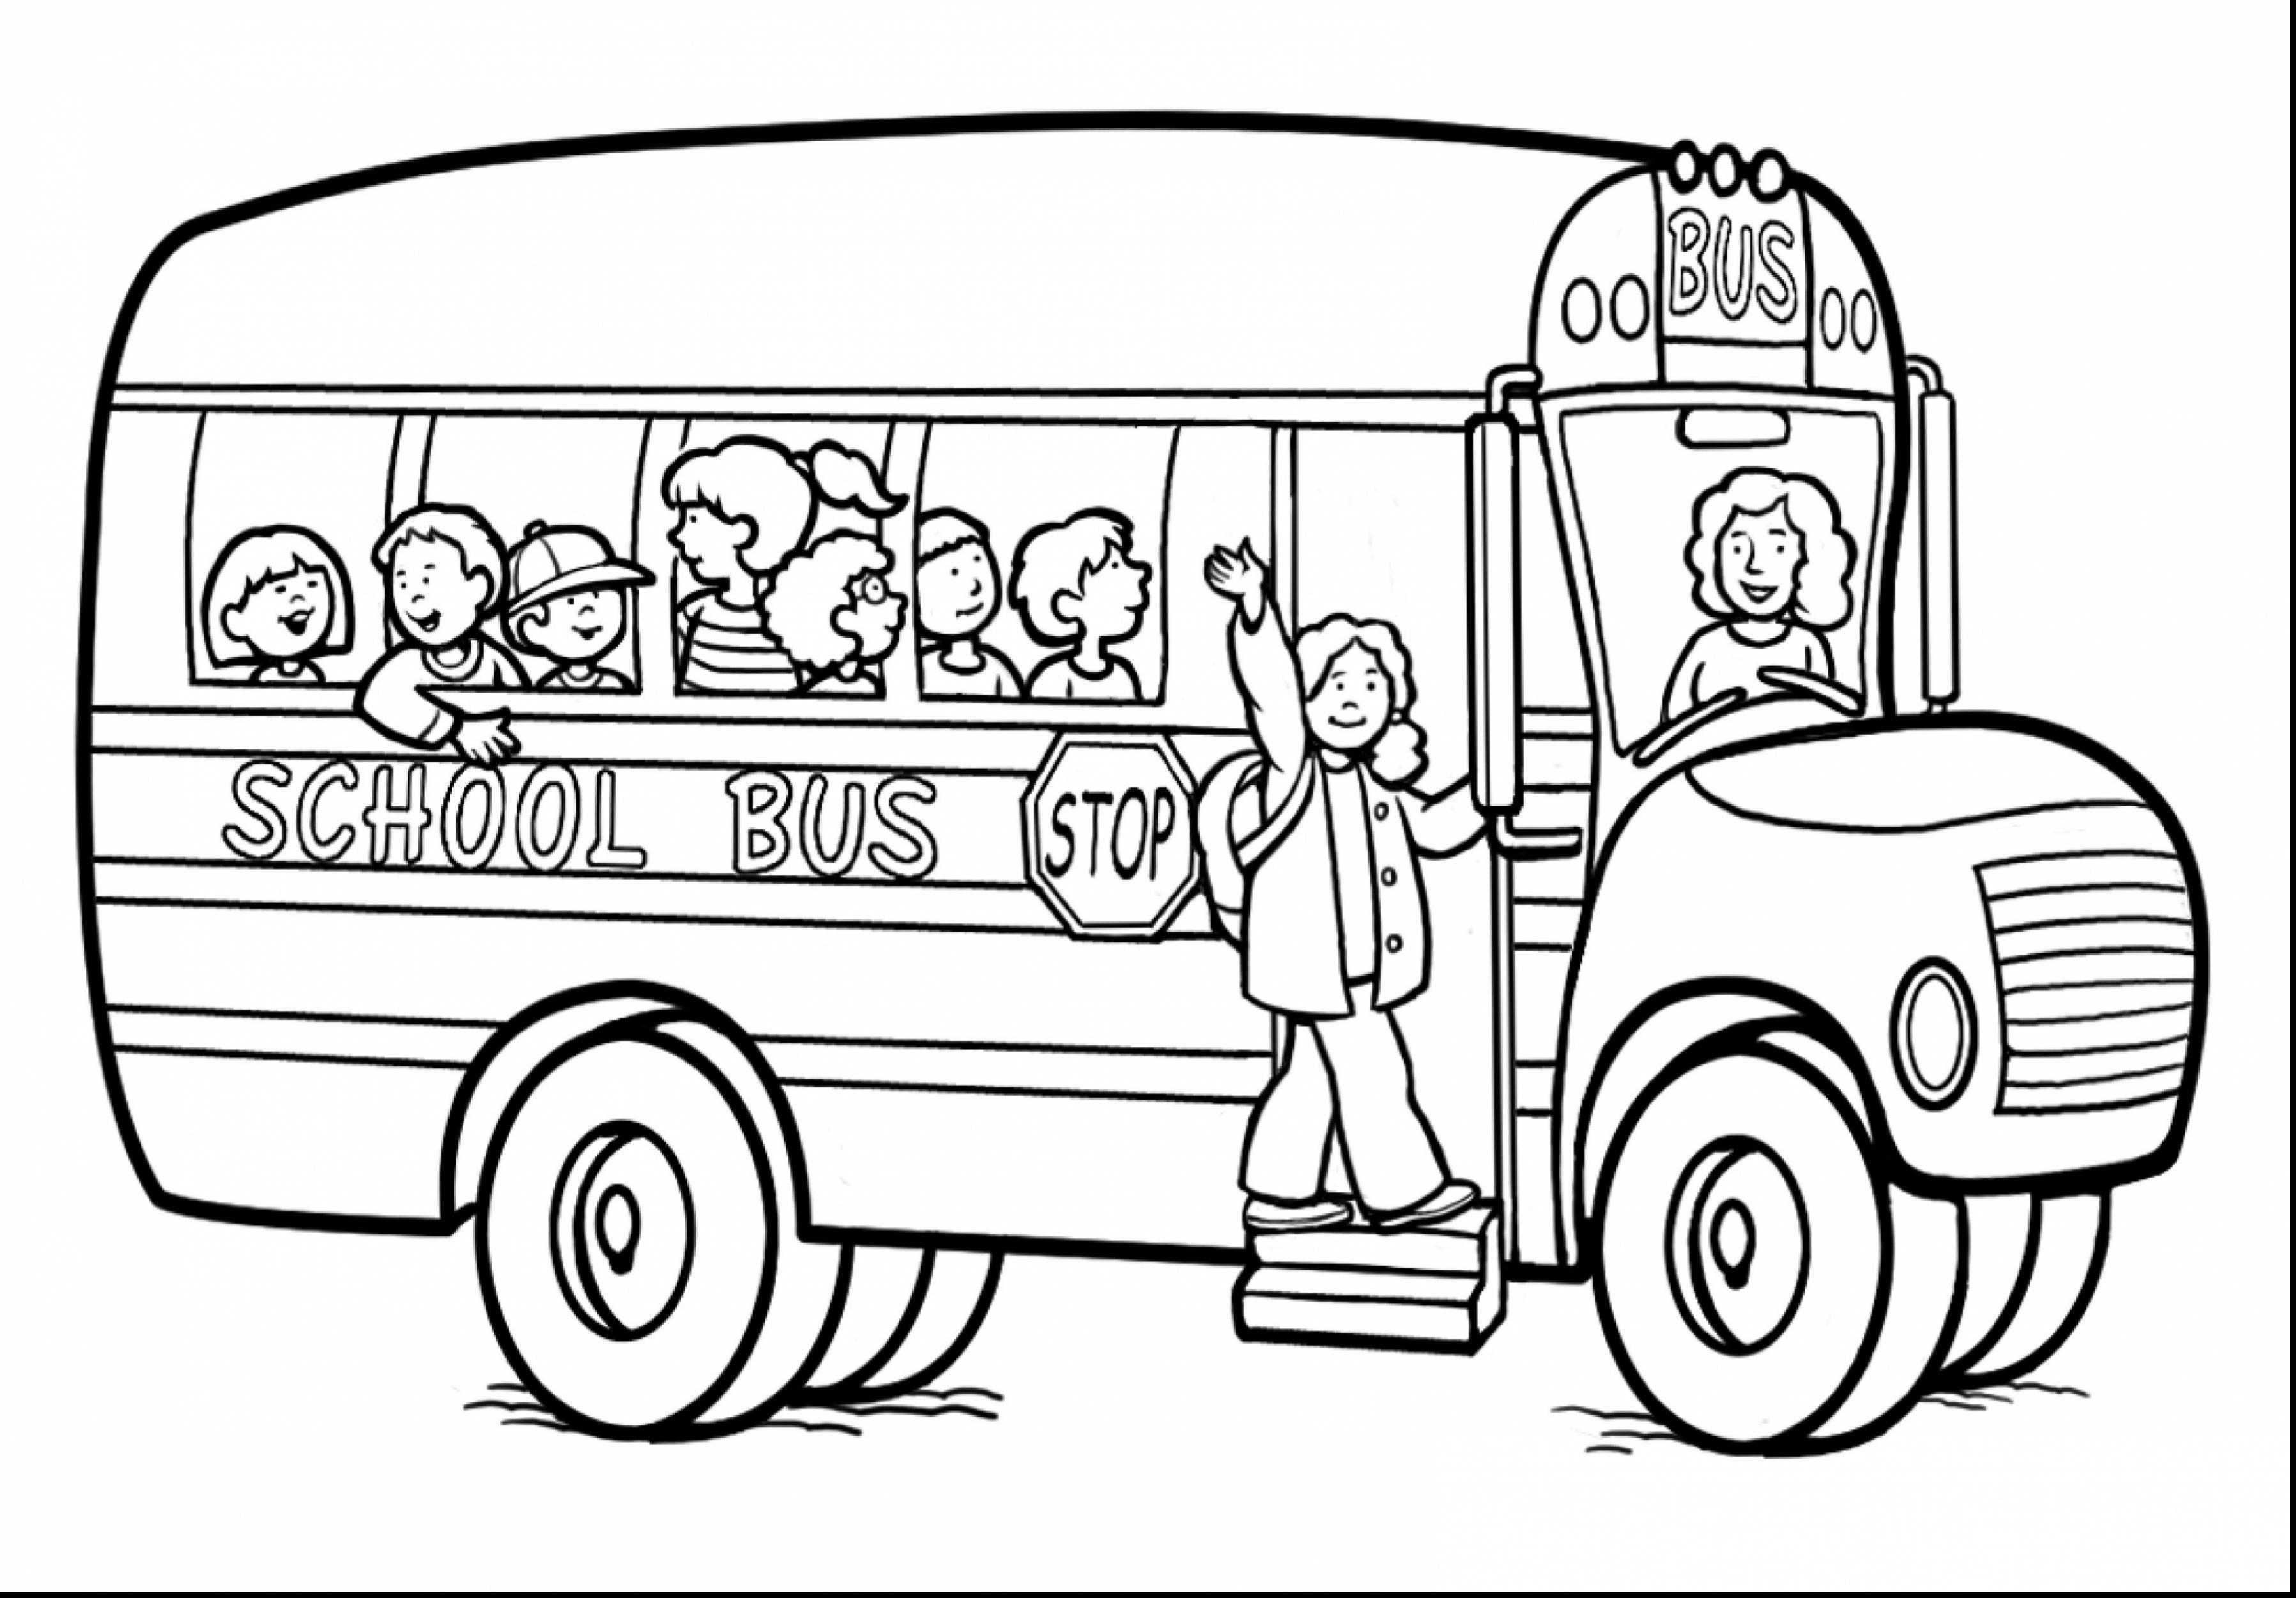 School Bus Ic Ce 1